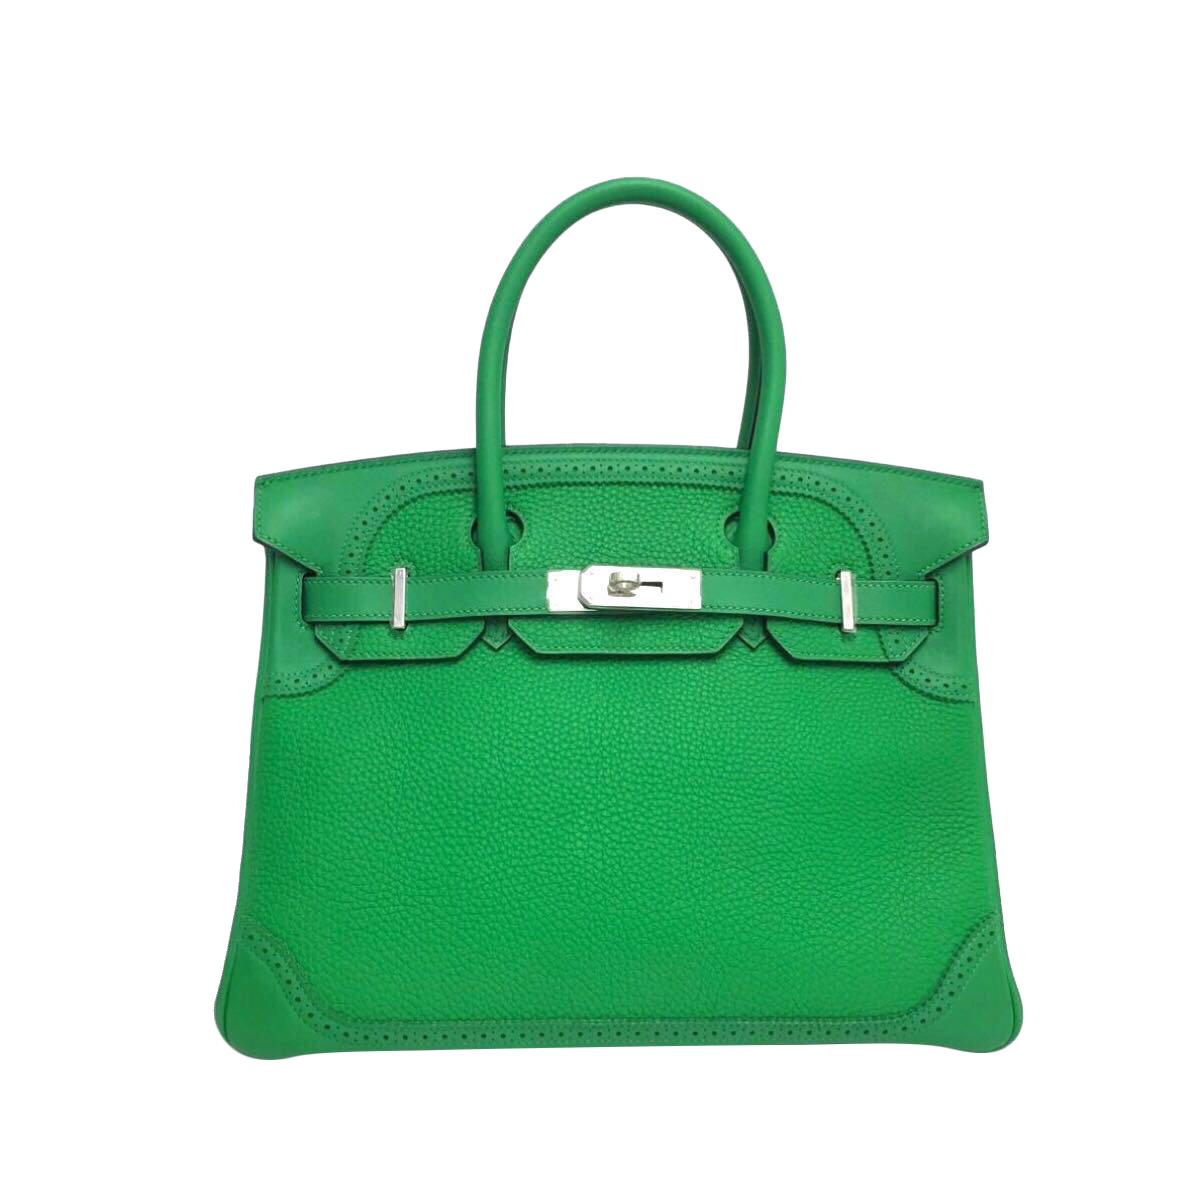 Sac Hermès modèle Birkin 30  Edition Ghillies